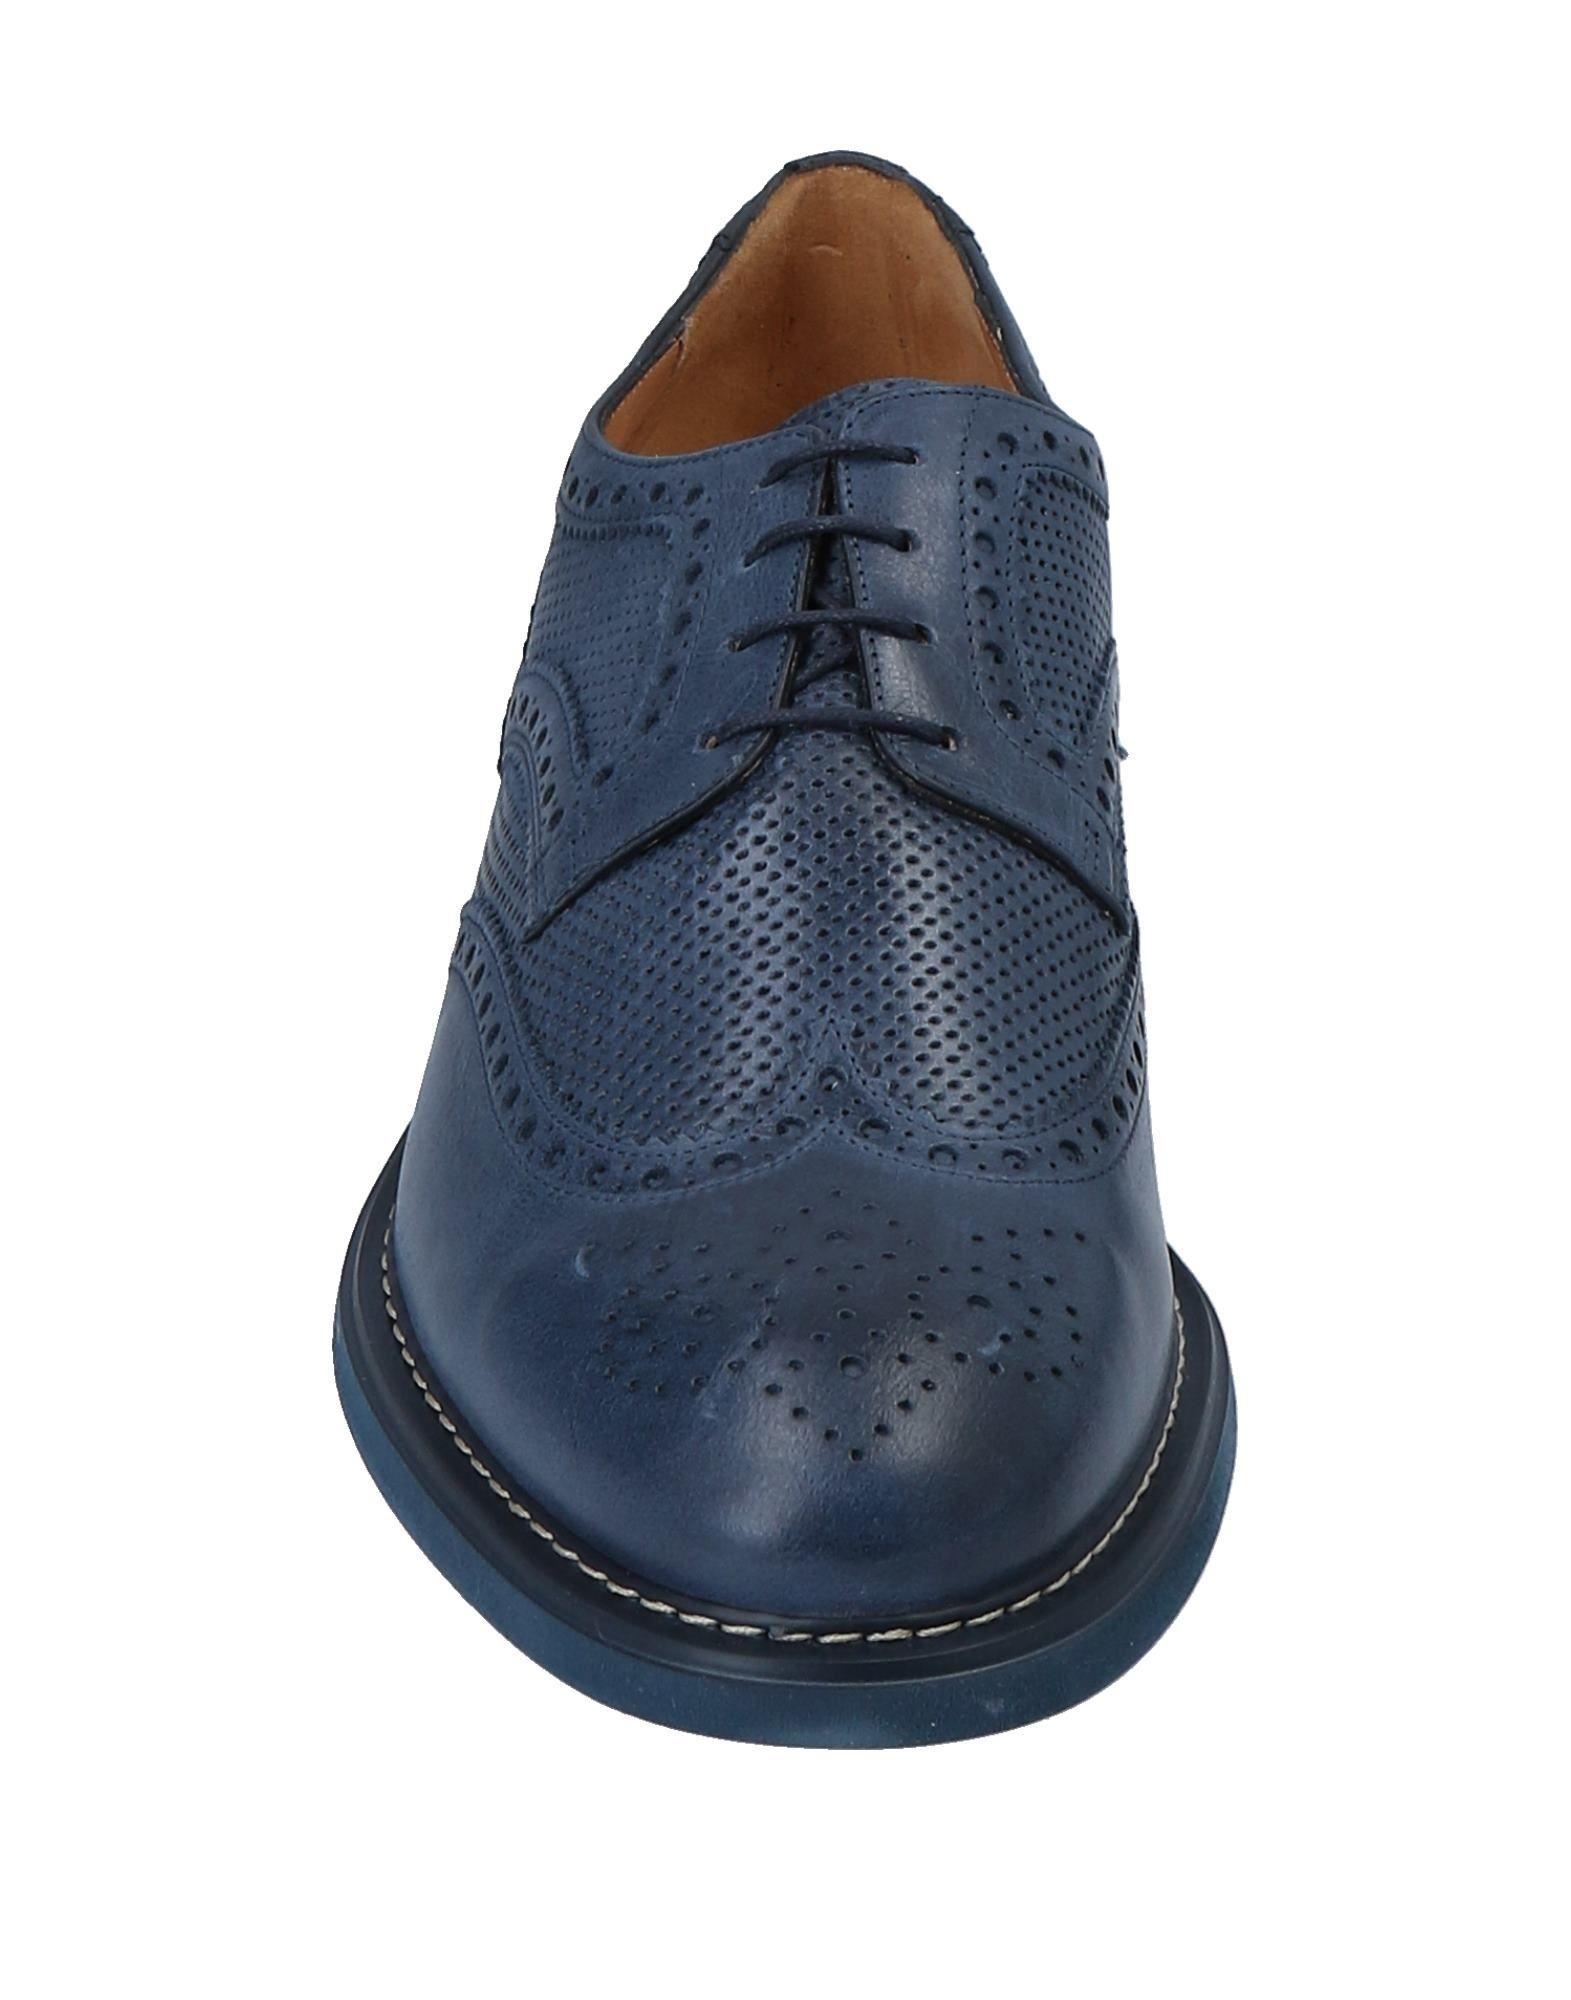 Rabatt Schnürschuhe echte Schuhe Antica Cuoieria Schnürschuhe Rabatt Herren  11546806IL d348d4